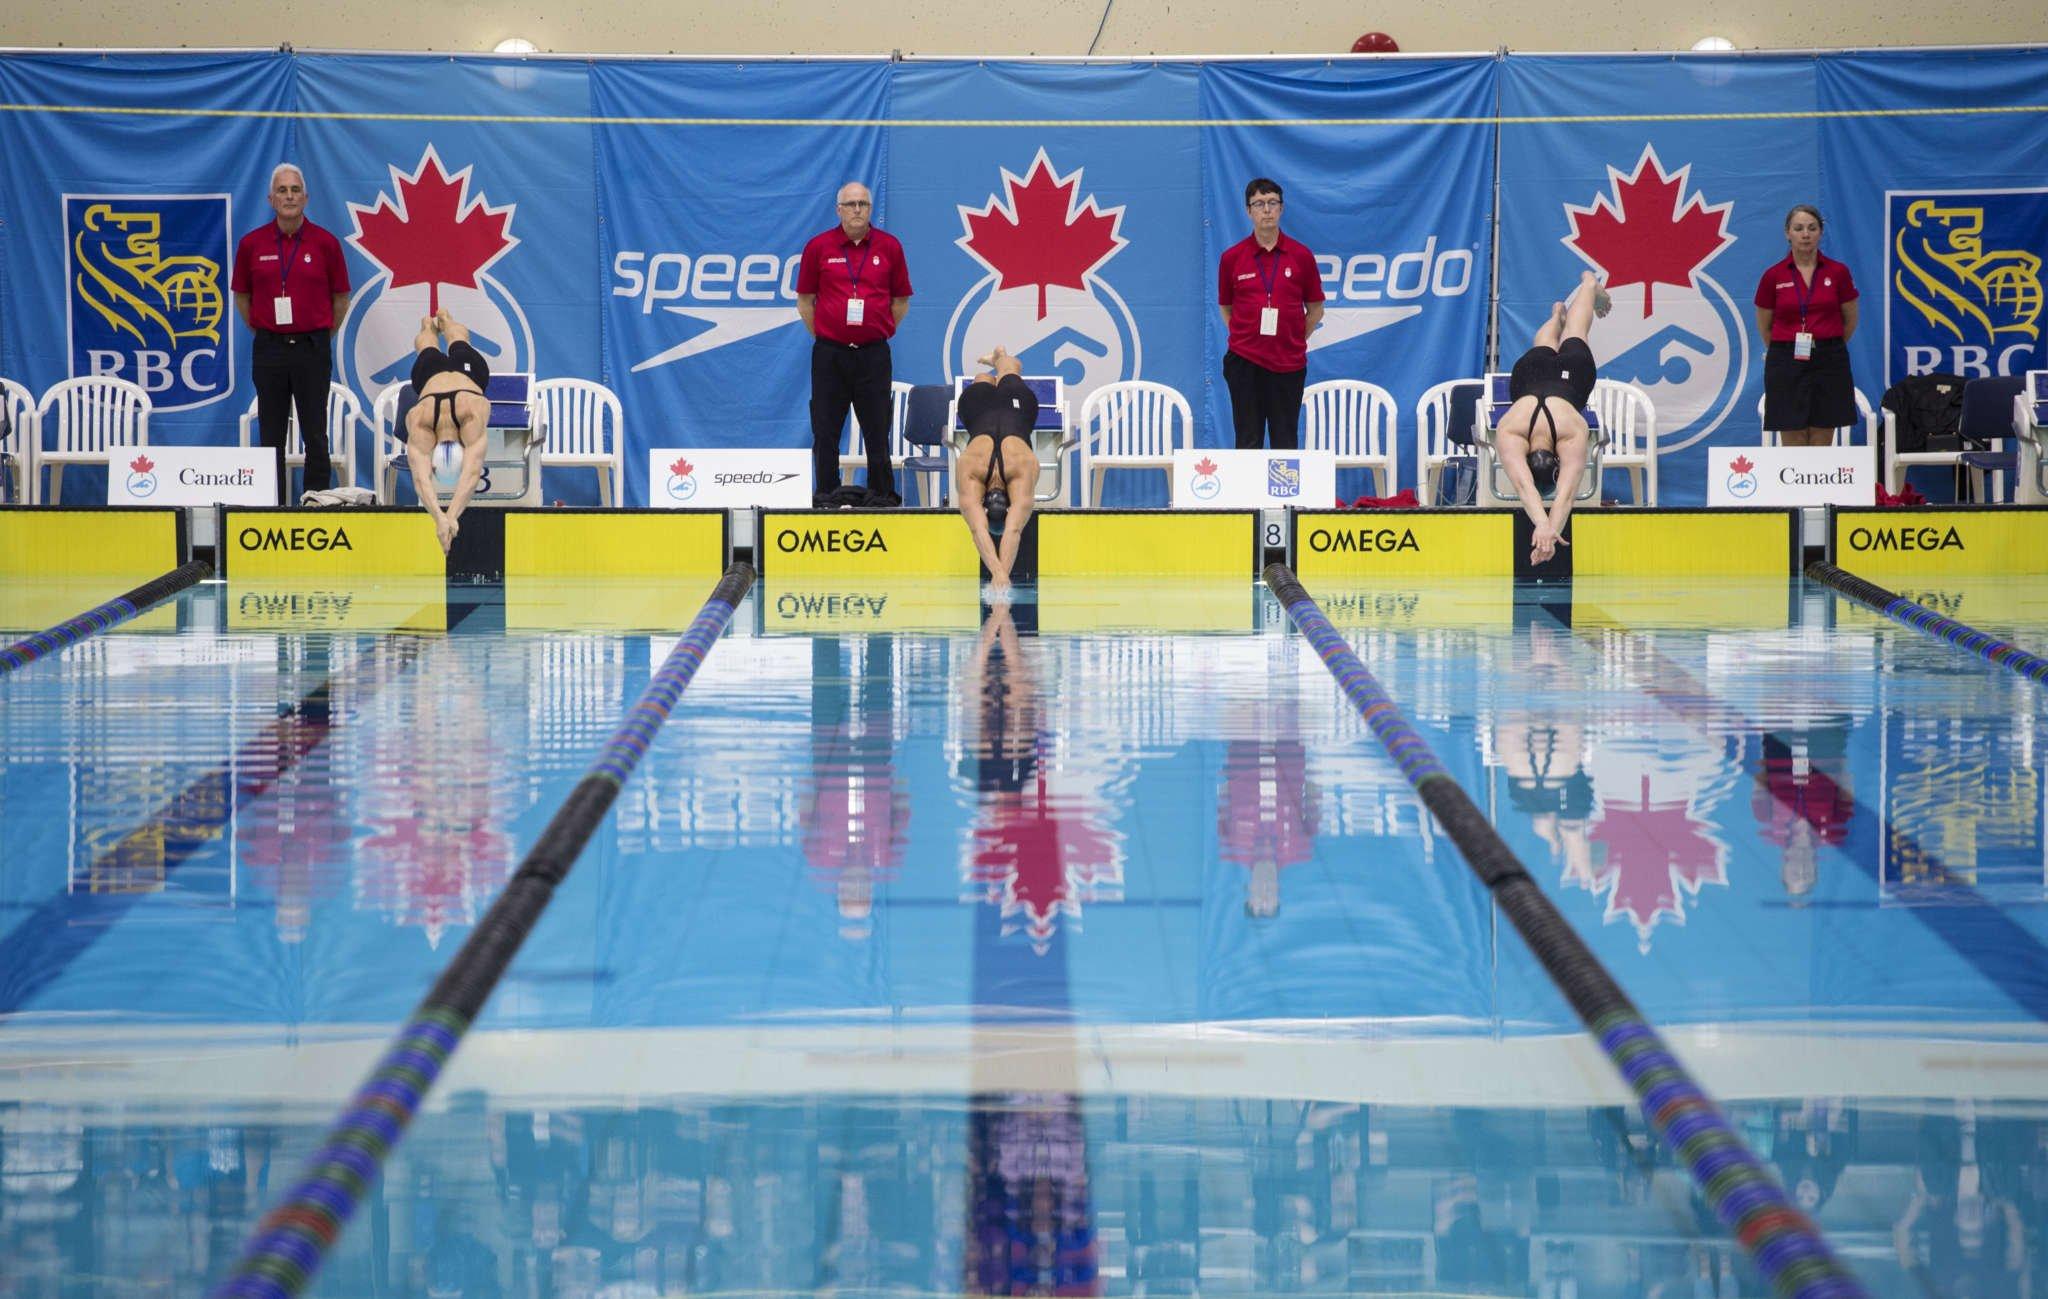 College Swim Meet, Mens 4 x 100 Freestyle Relay Race